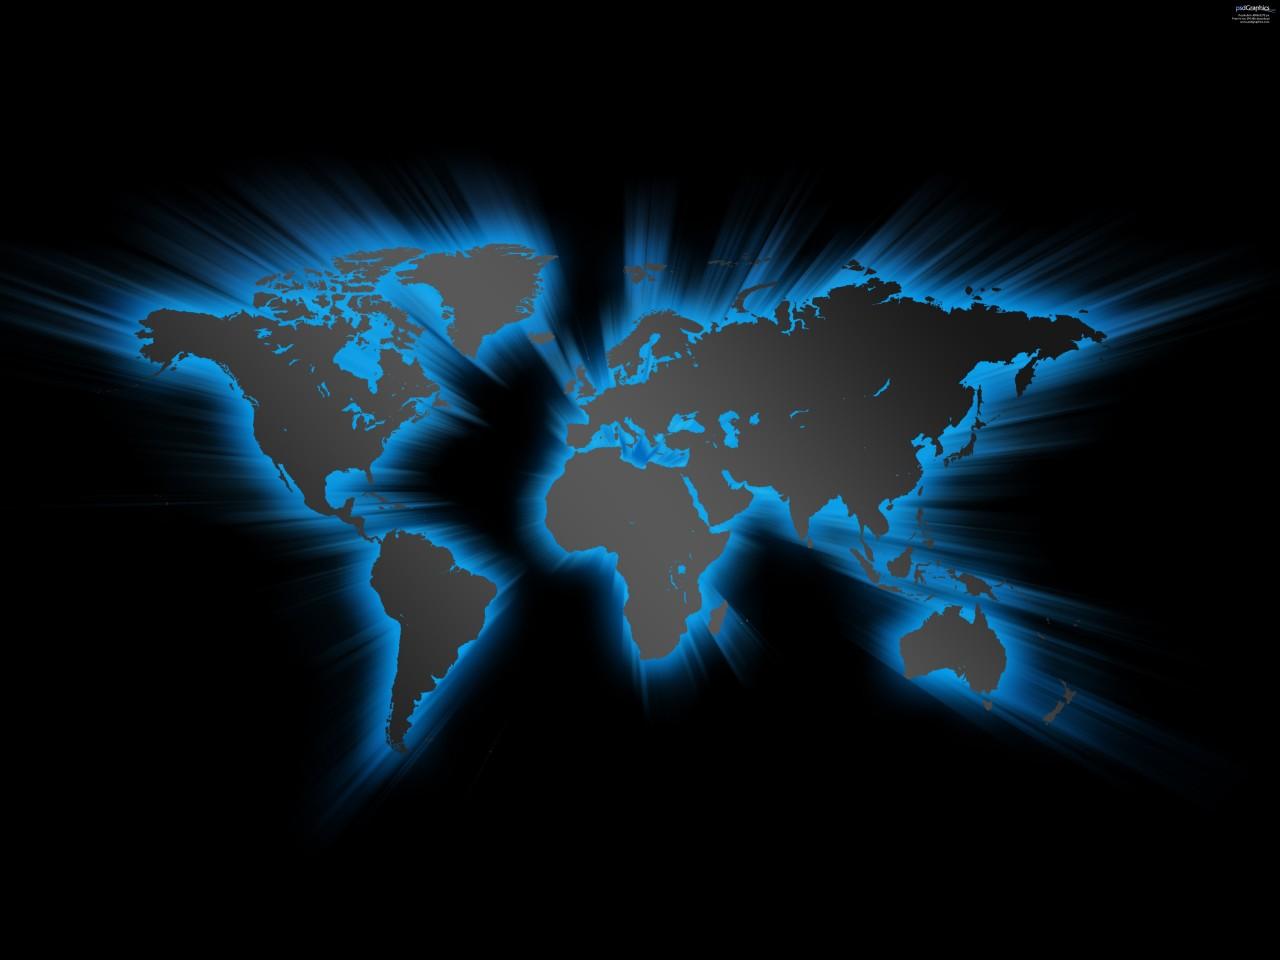 Blue Effect World Map - HD Wallpapers